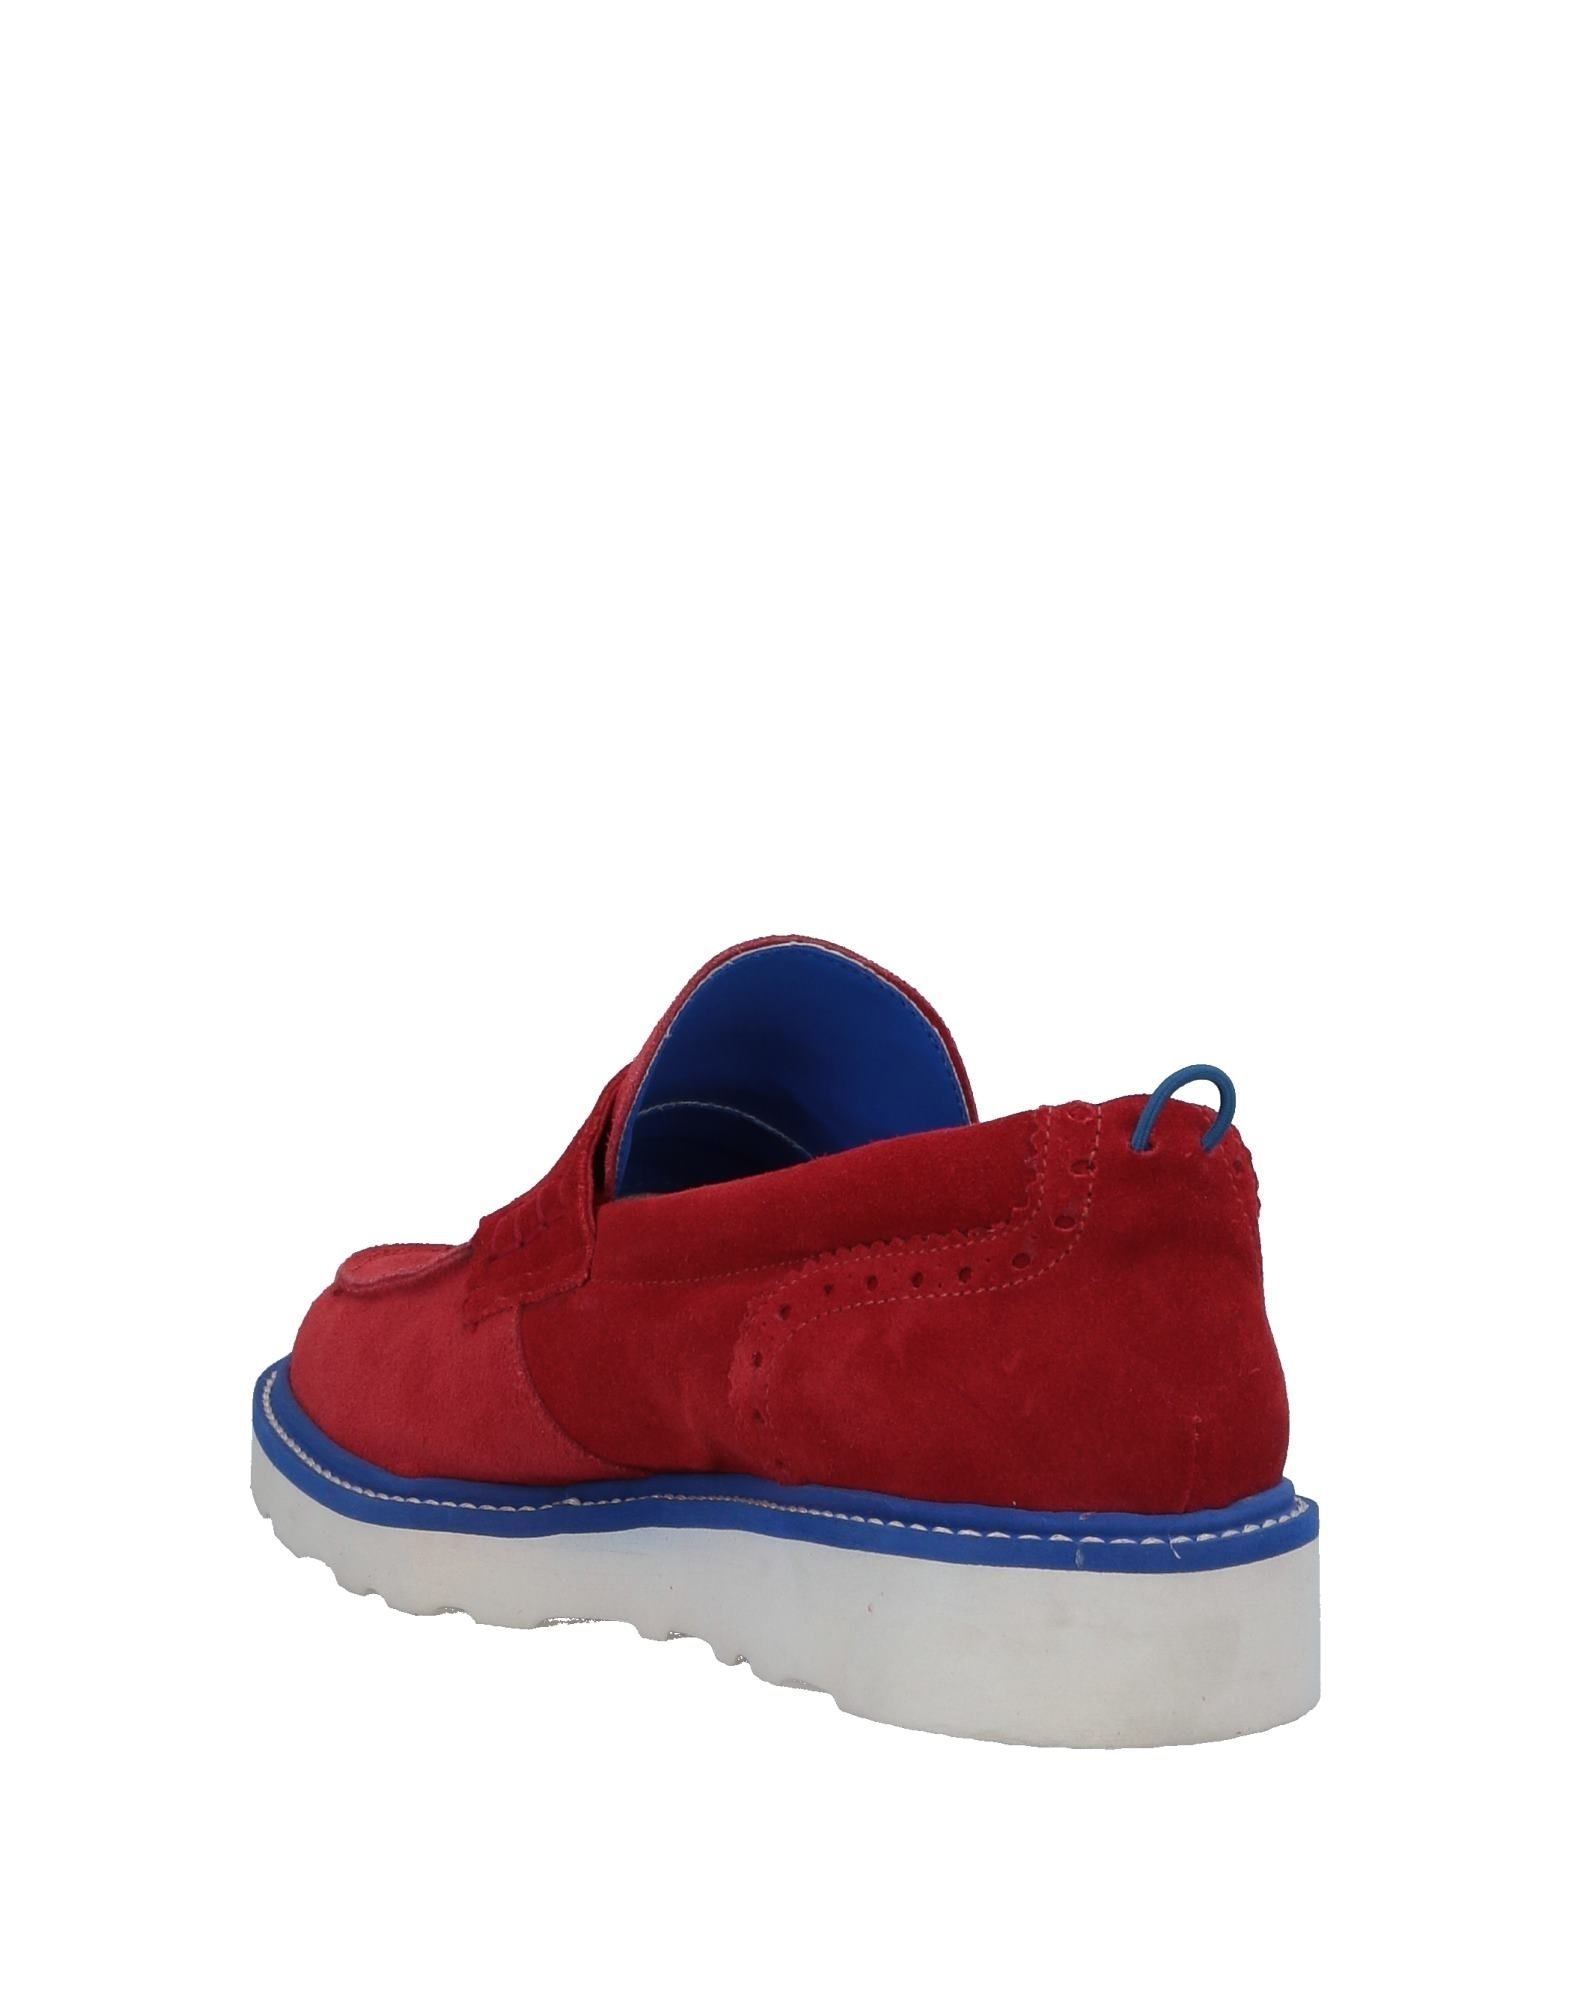 Rabatt echte Schuhe Pulchrum! Mokassins Herren  11270037MT